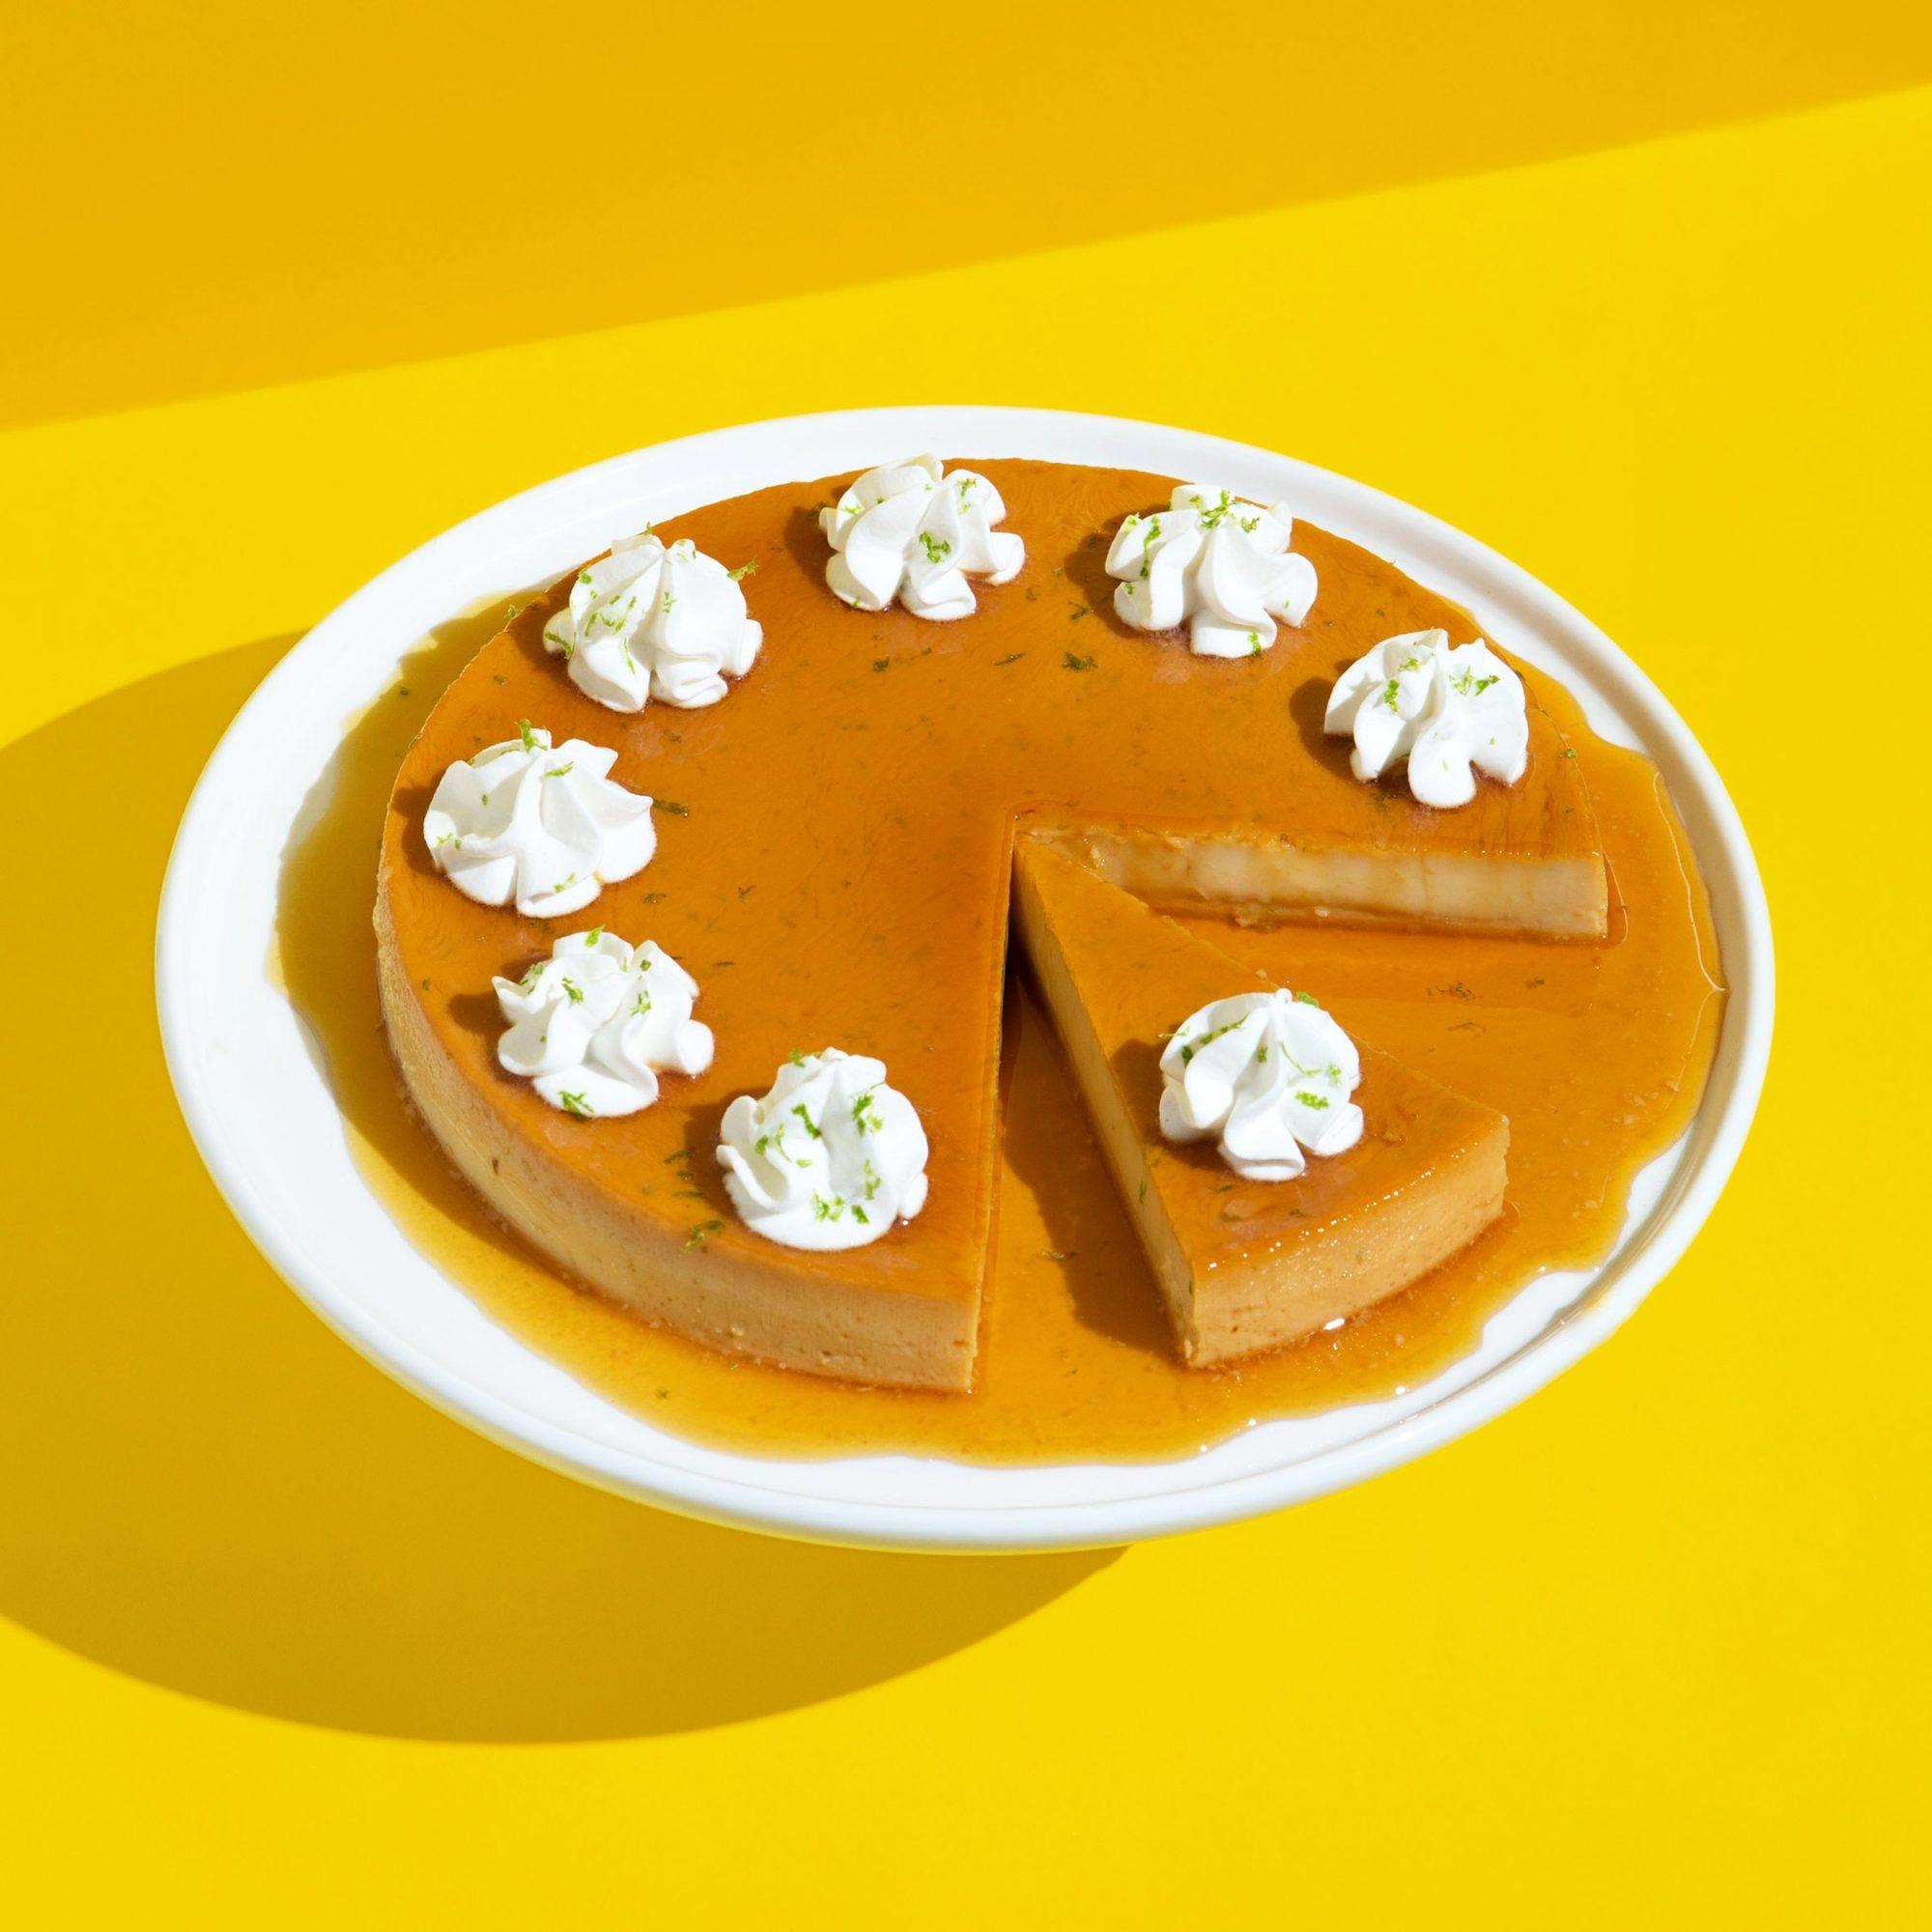 chicano-eats-3.jpg